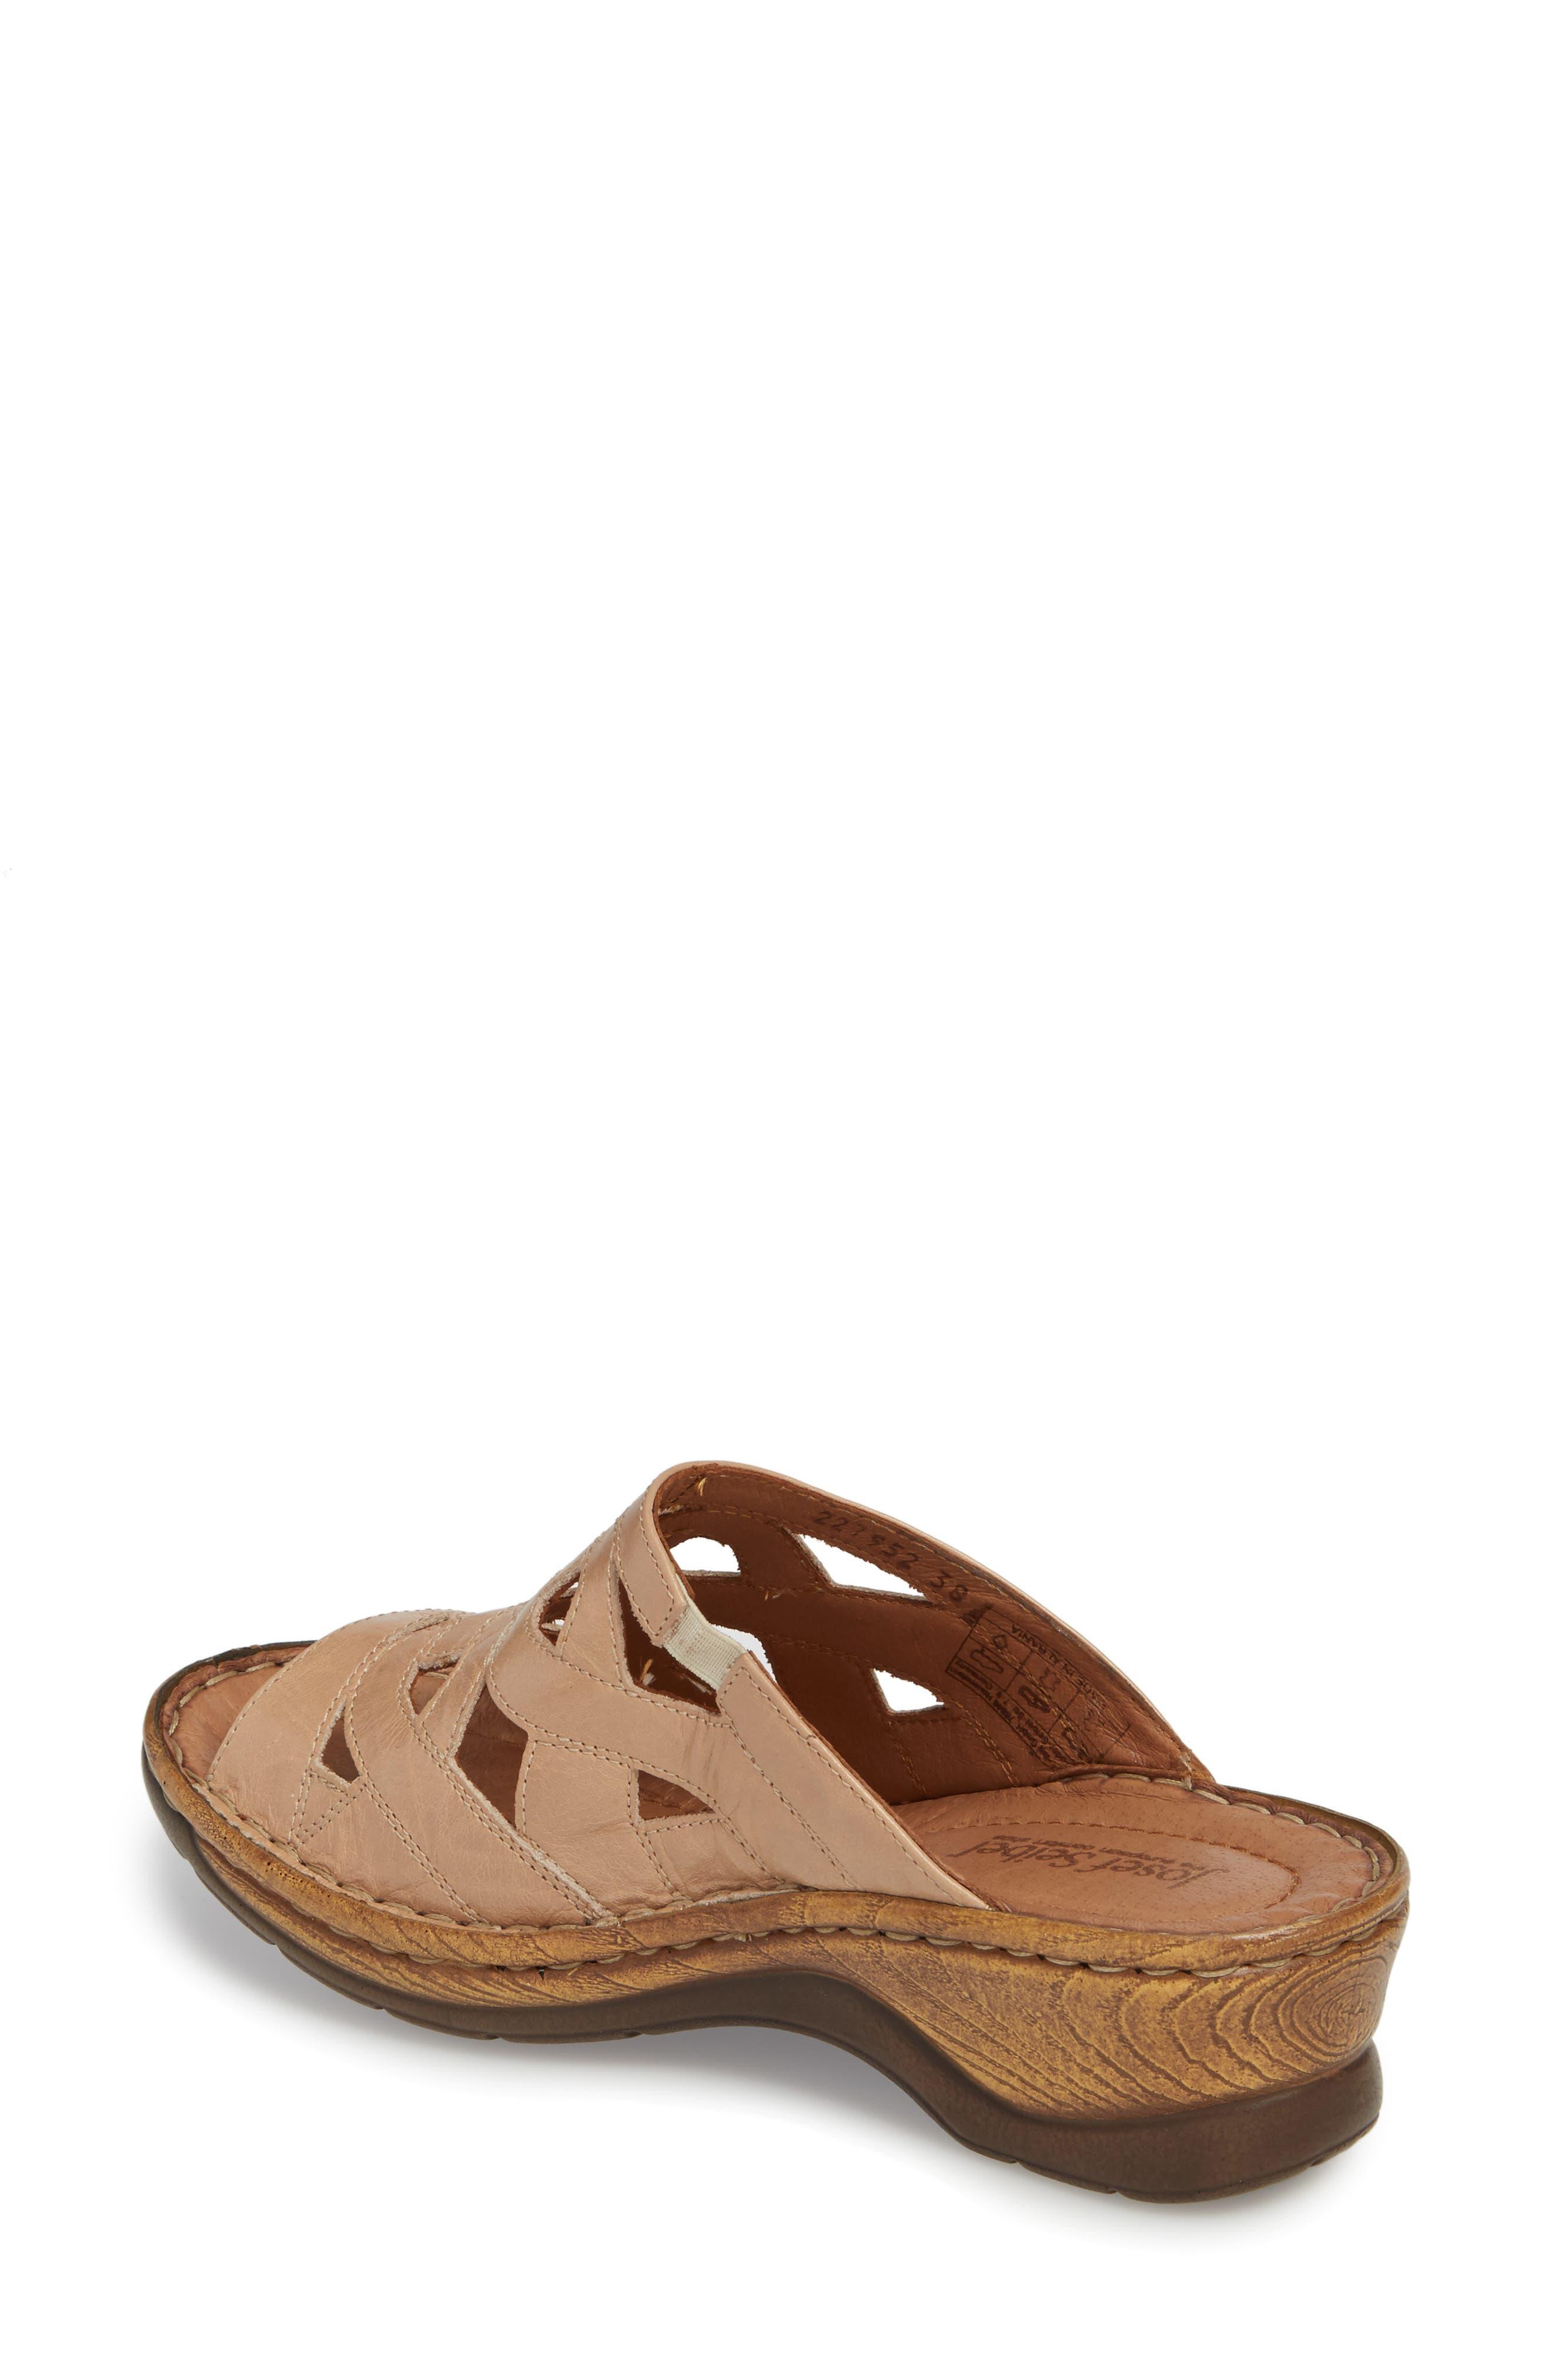 Catalonia 44 Slide Sandal,                             Alternate thumbnail 2, color,                             Beige Leather